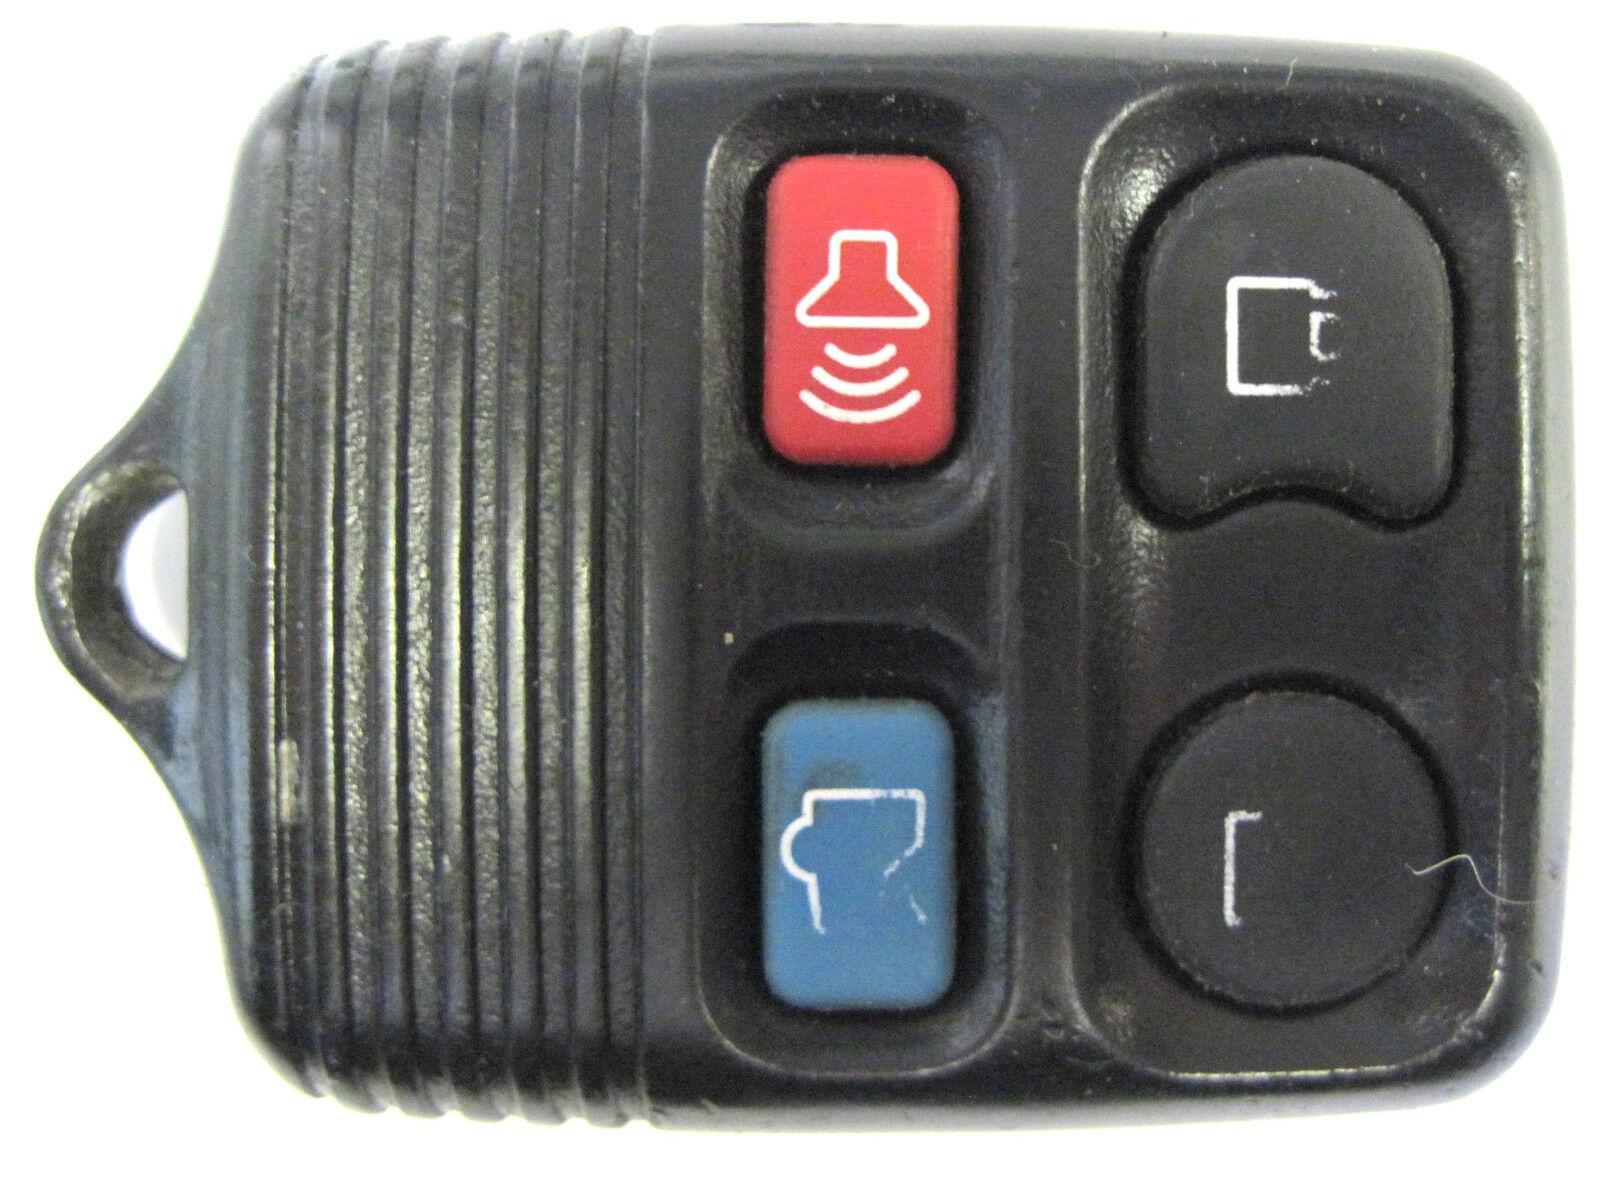 key keyless entry remote control 1999-2006 Ford Thunderbird transmitter keyfob